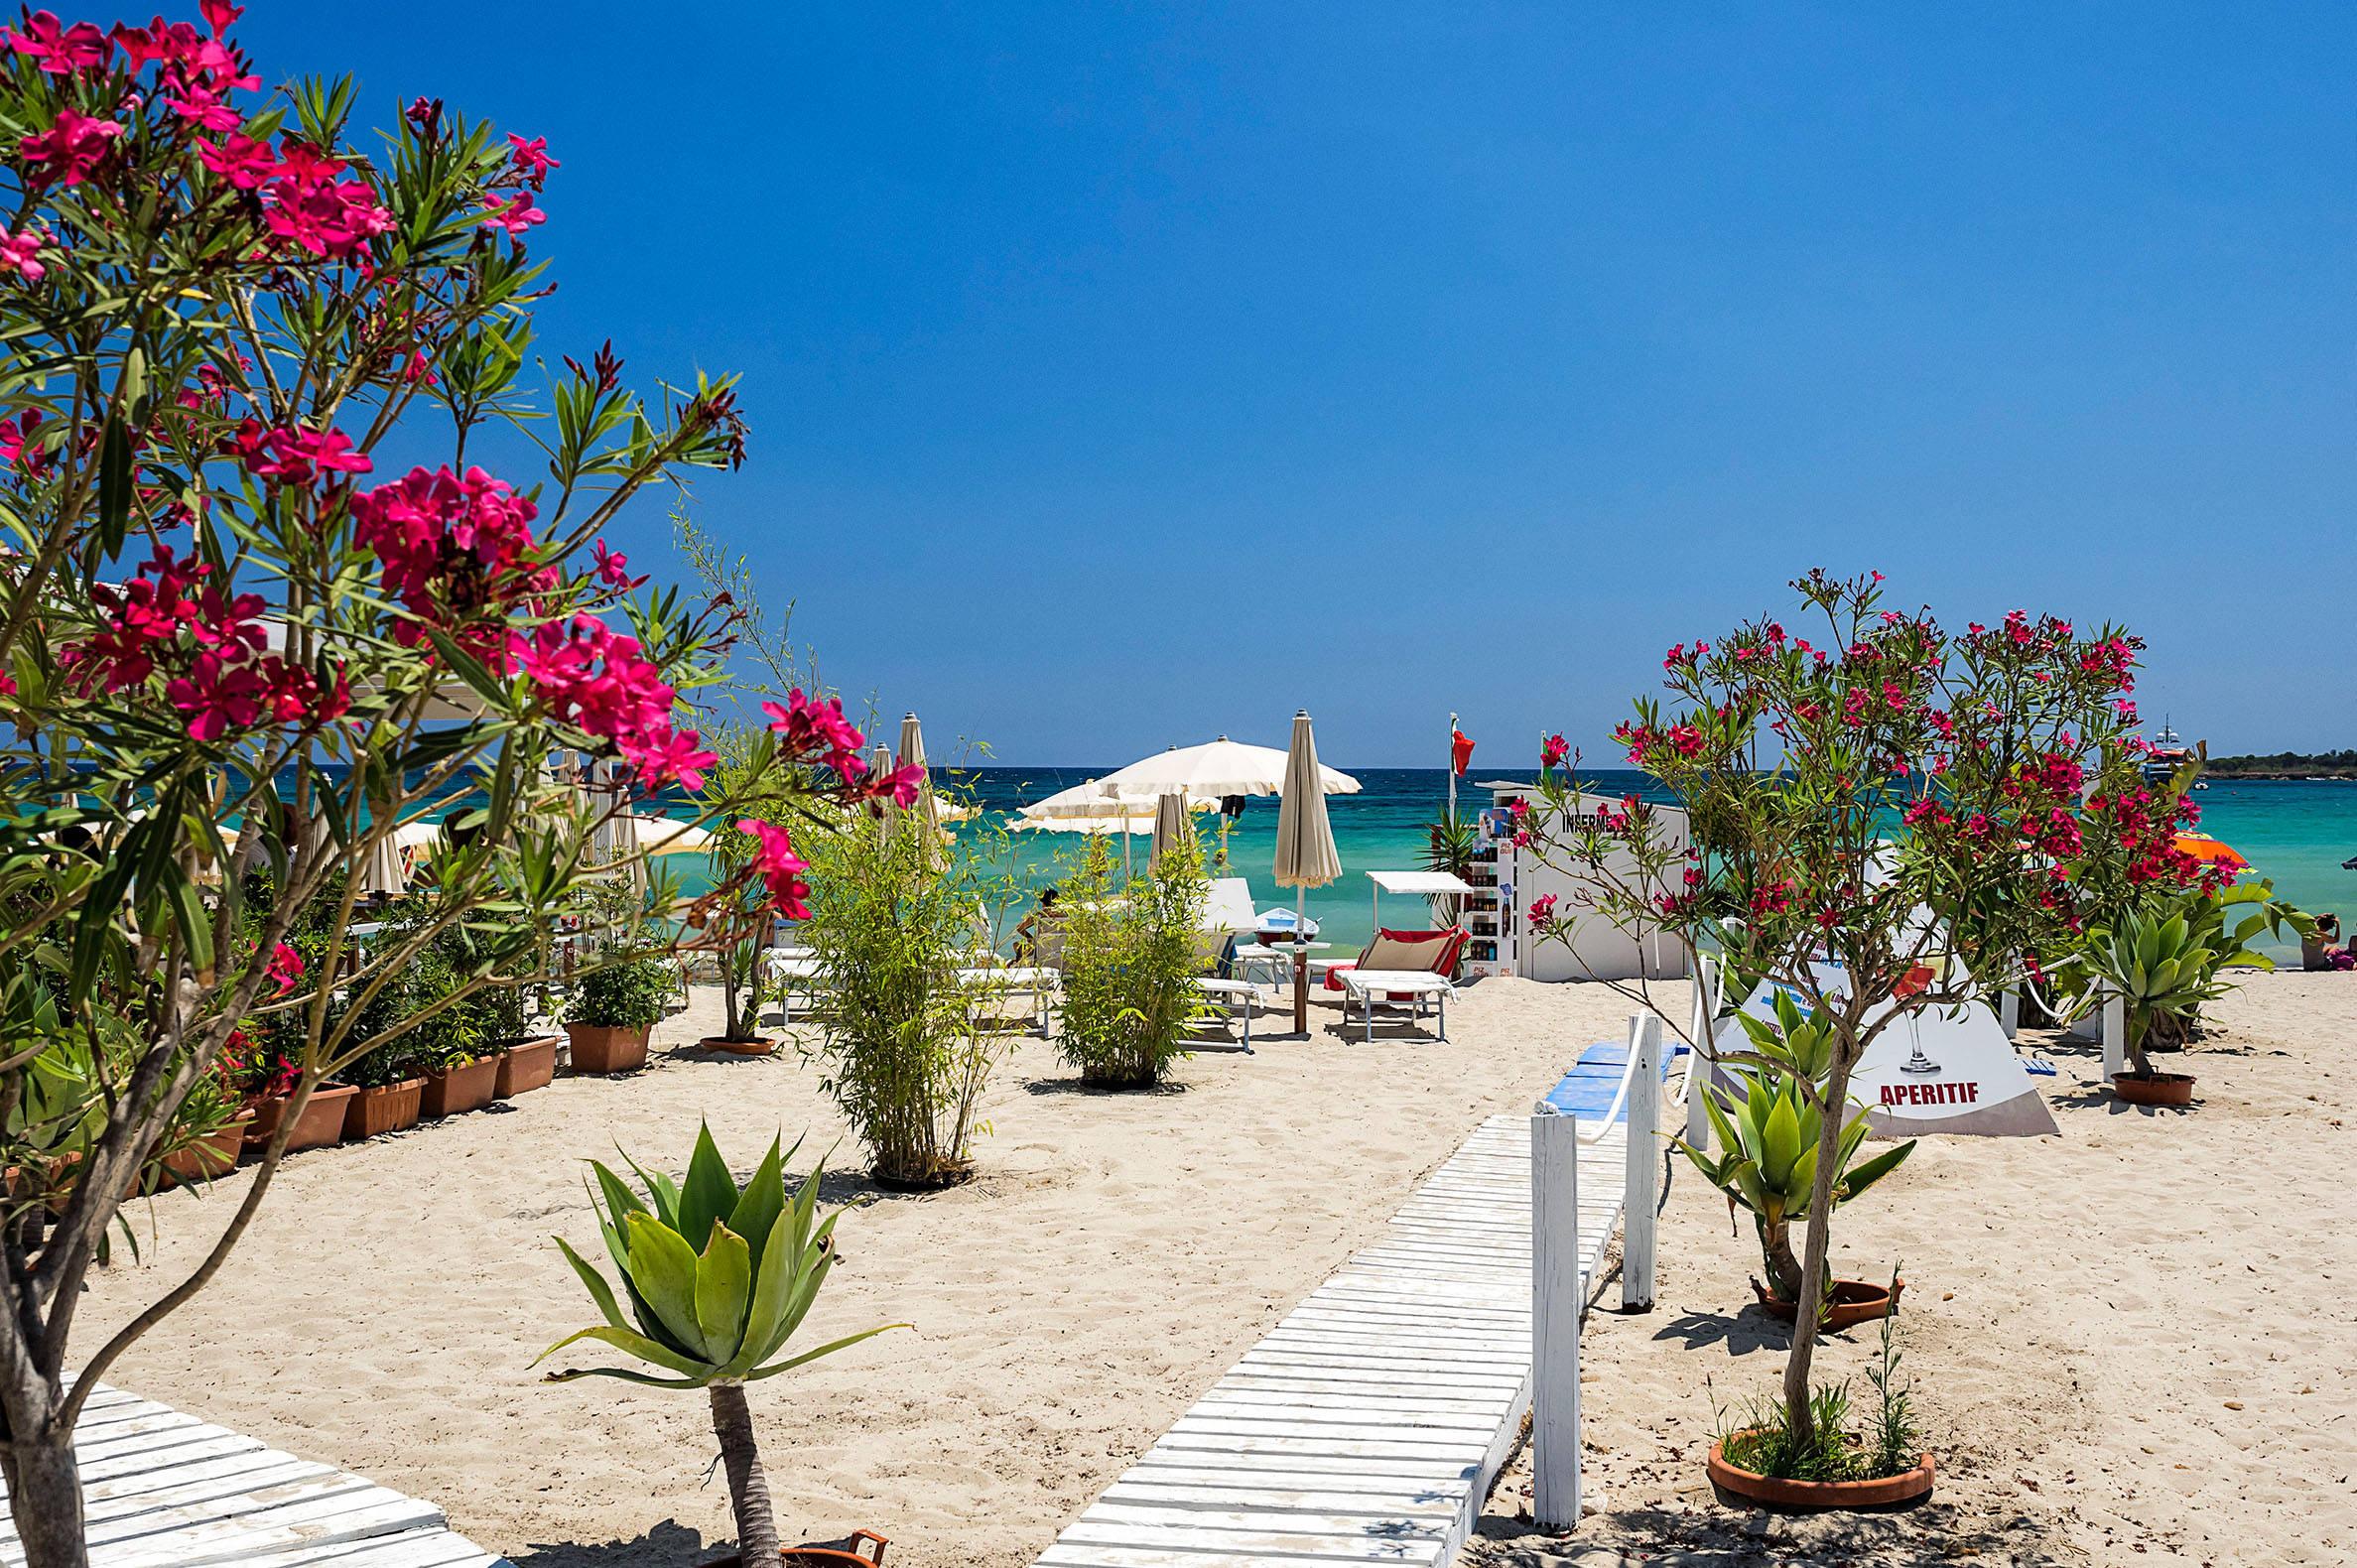 Vacation Rental Villa Cibele - 2 Guests